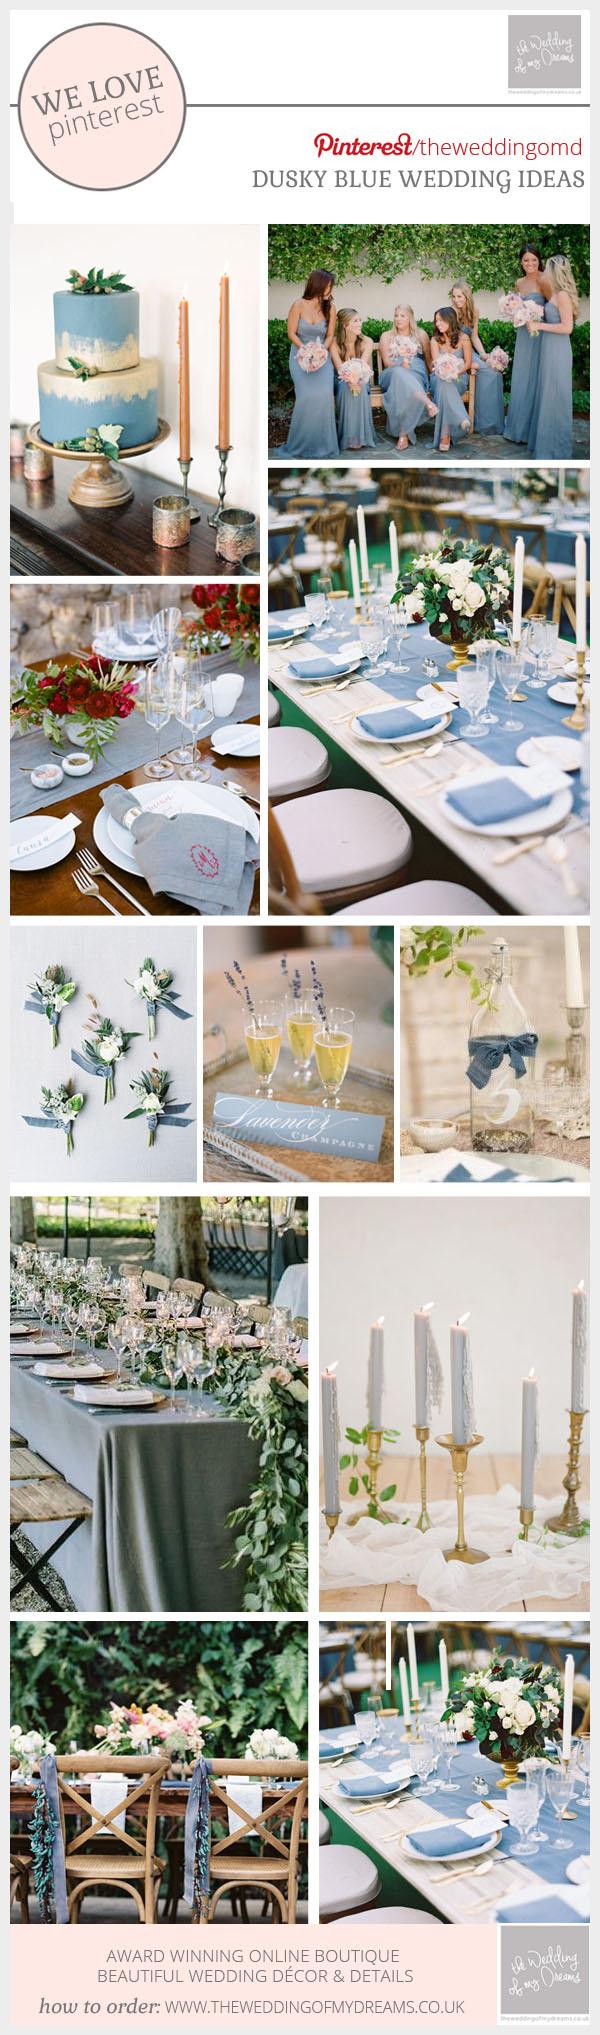 Wedding Decor Details Dusky Blue Wedding Ideas Decorations Details